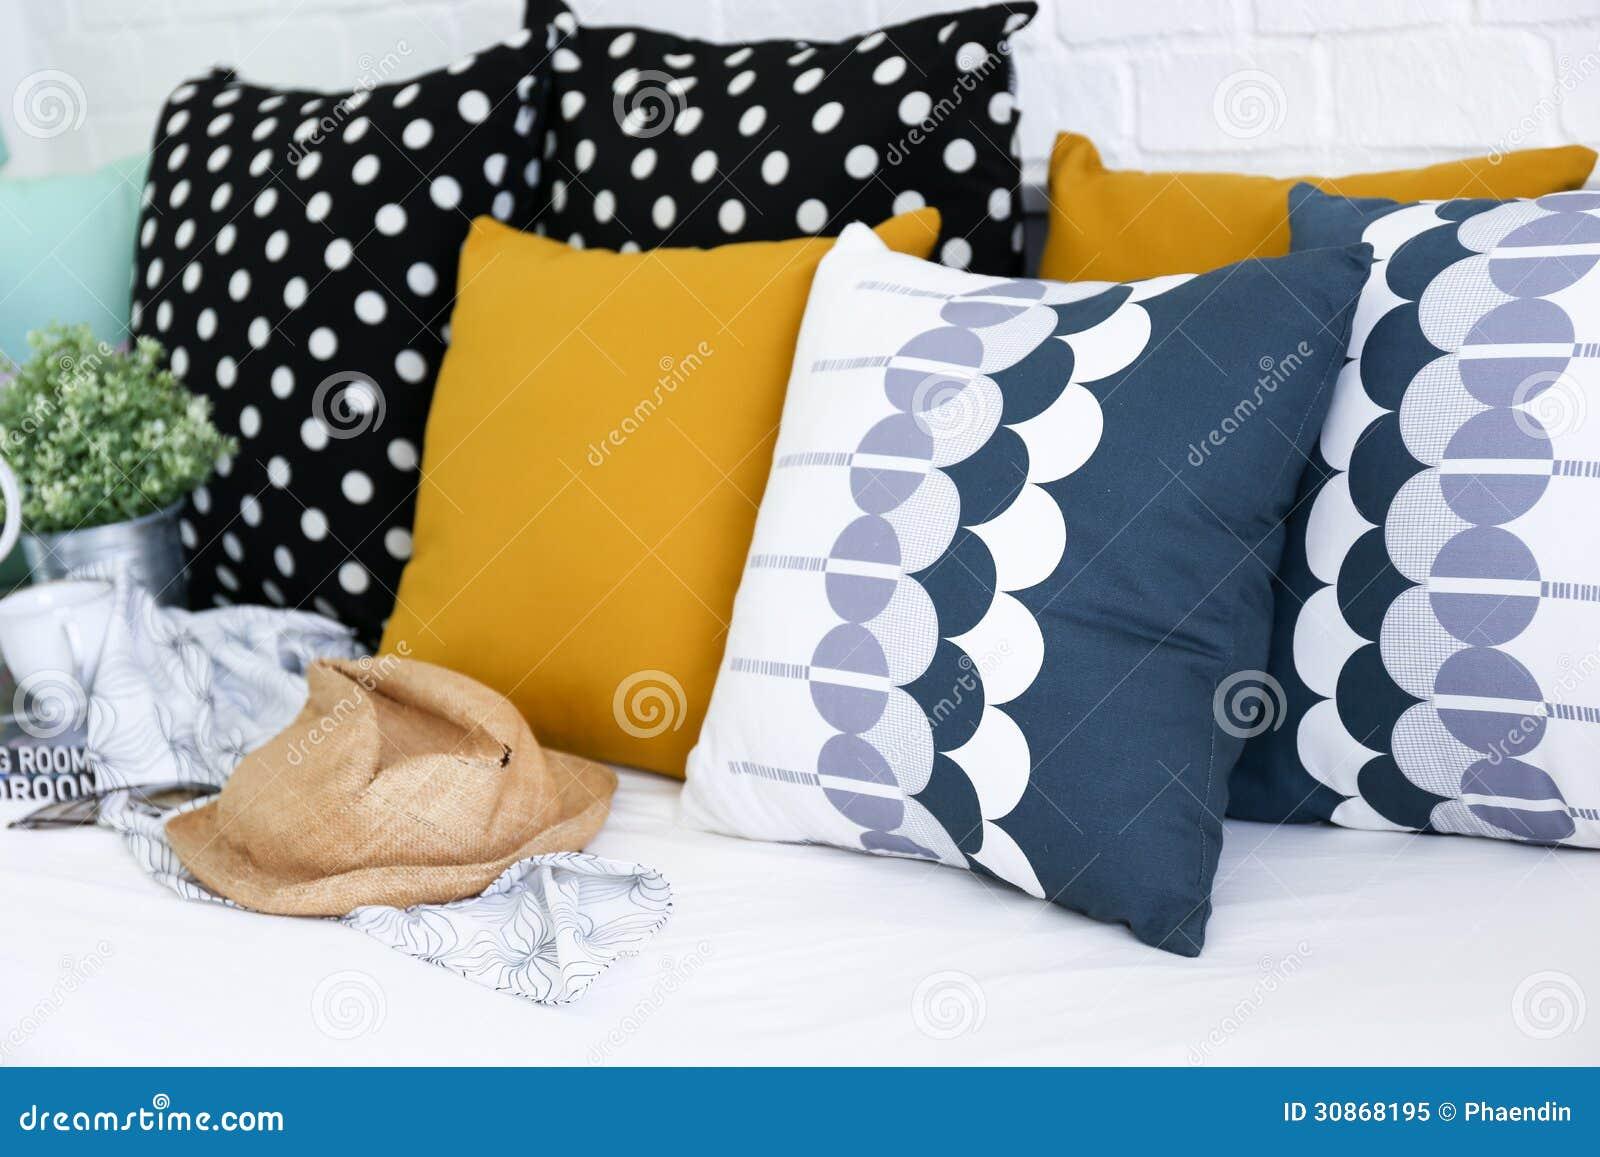 100 colorful pillows for sofa luxury throw pillows designer